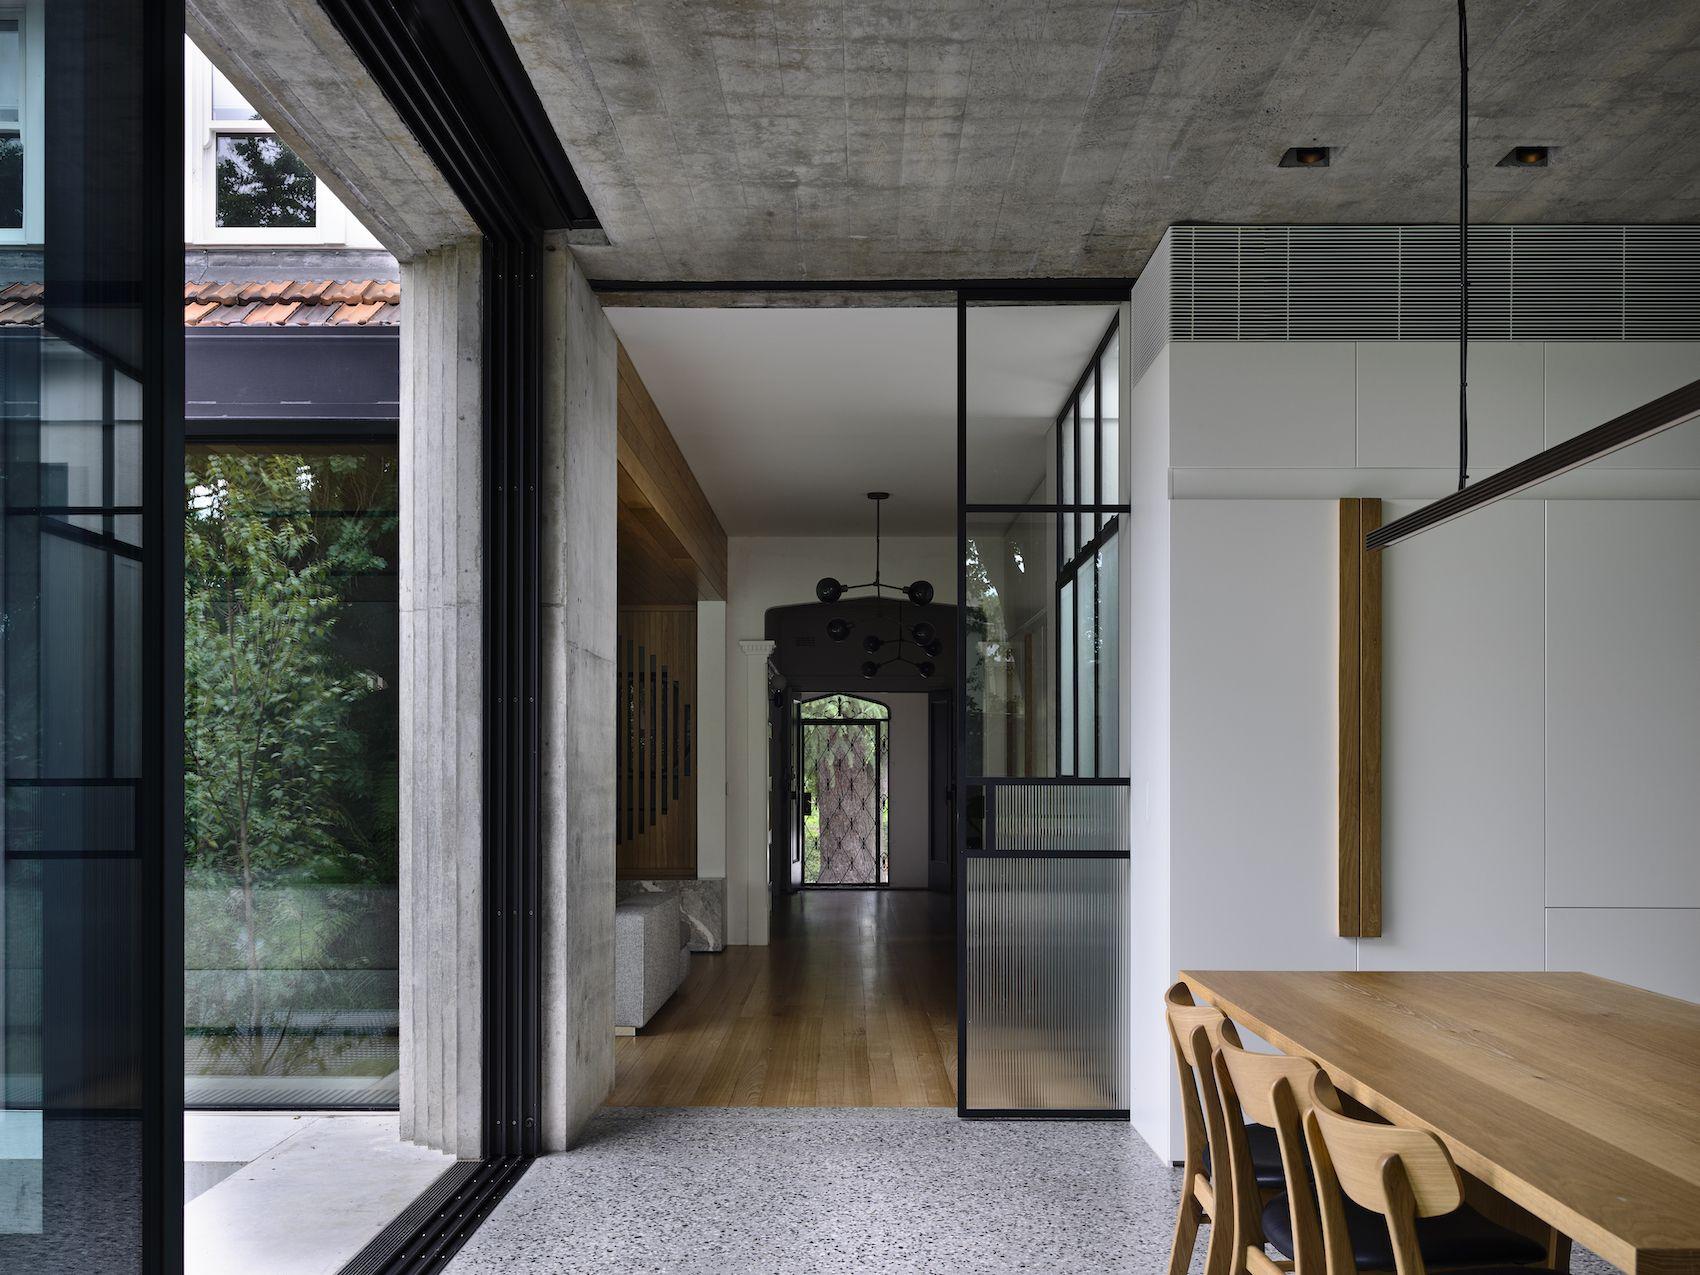 Pin on Residential Interior Design